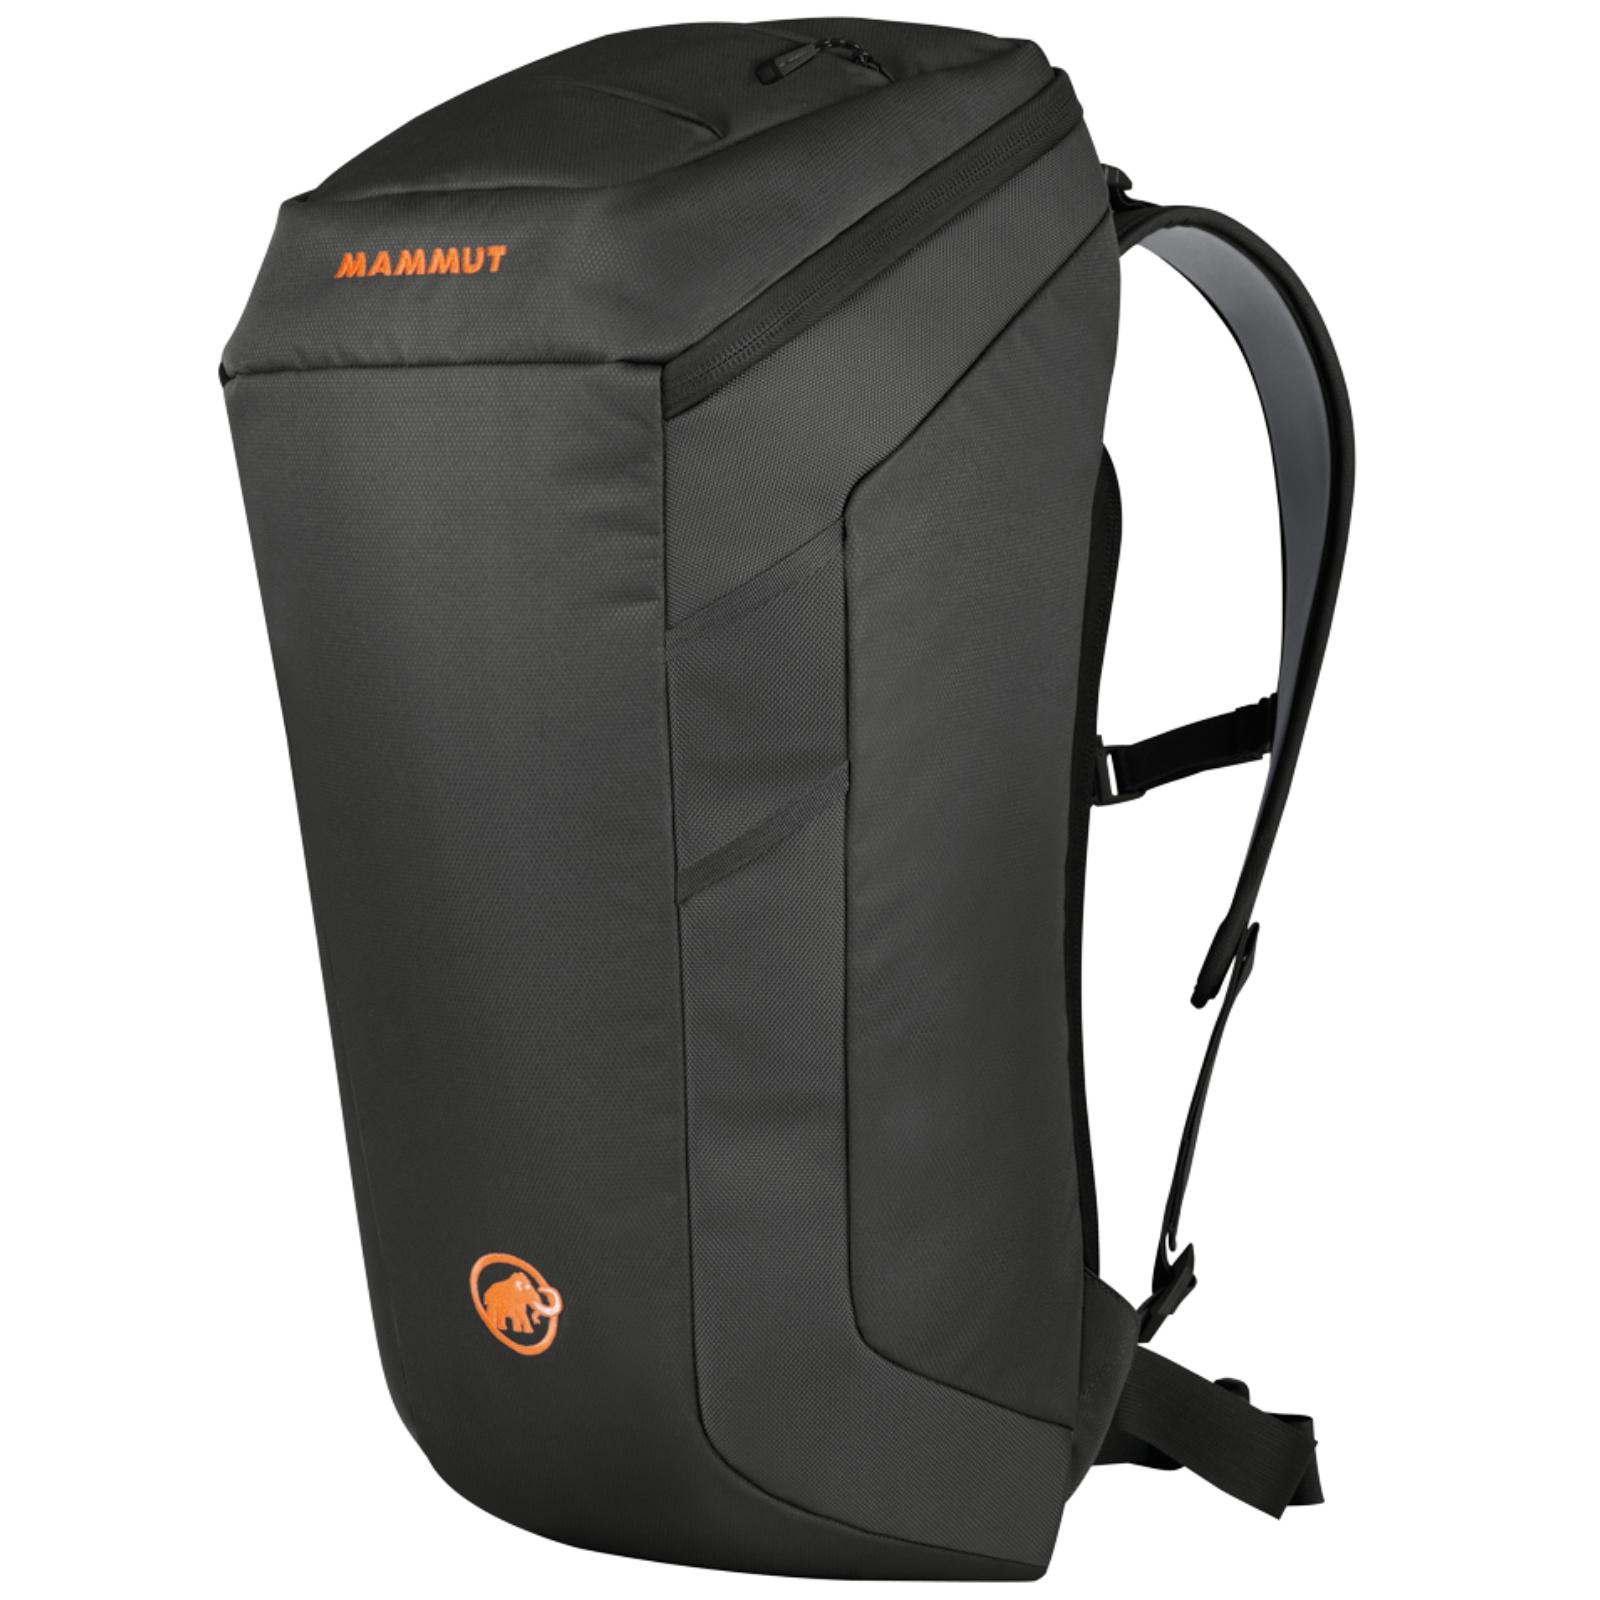 Lezecký batoh MAMMUT Neon Gear 45 - grafitový